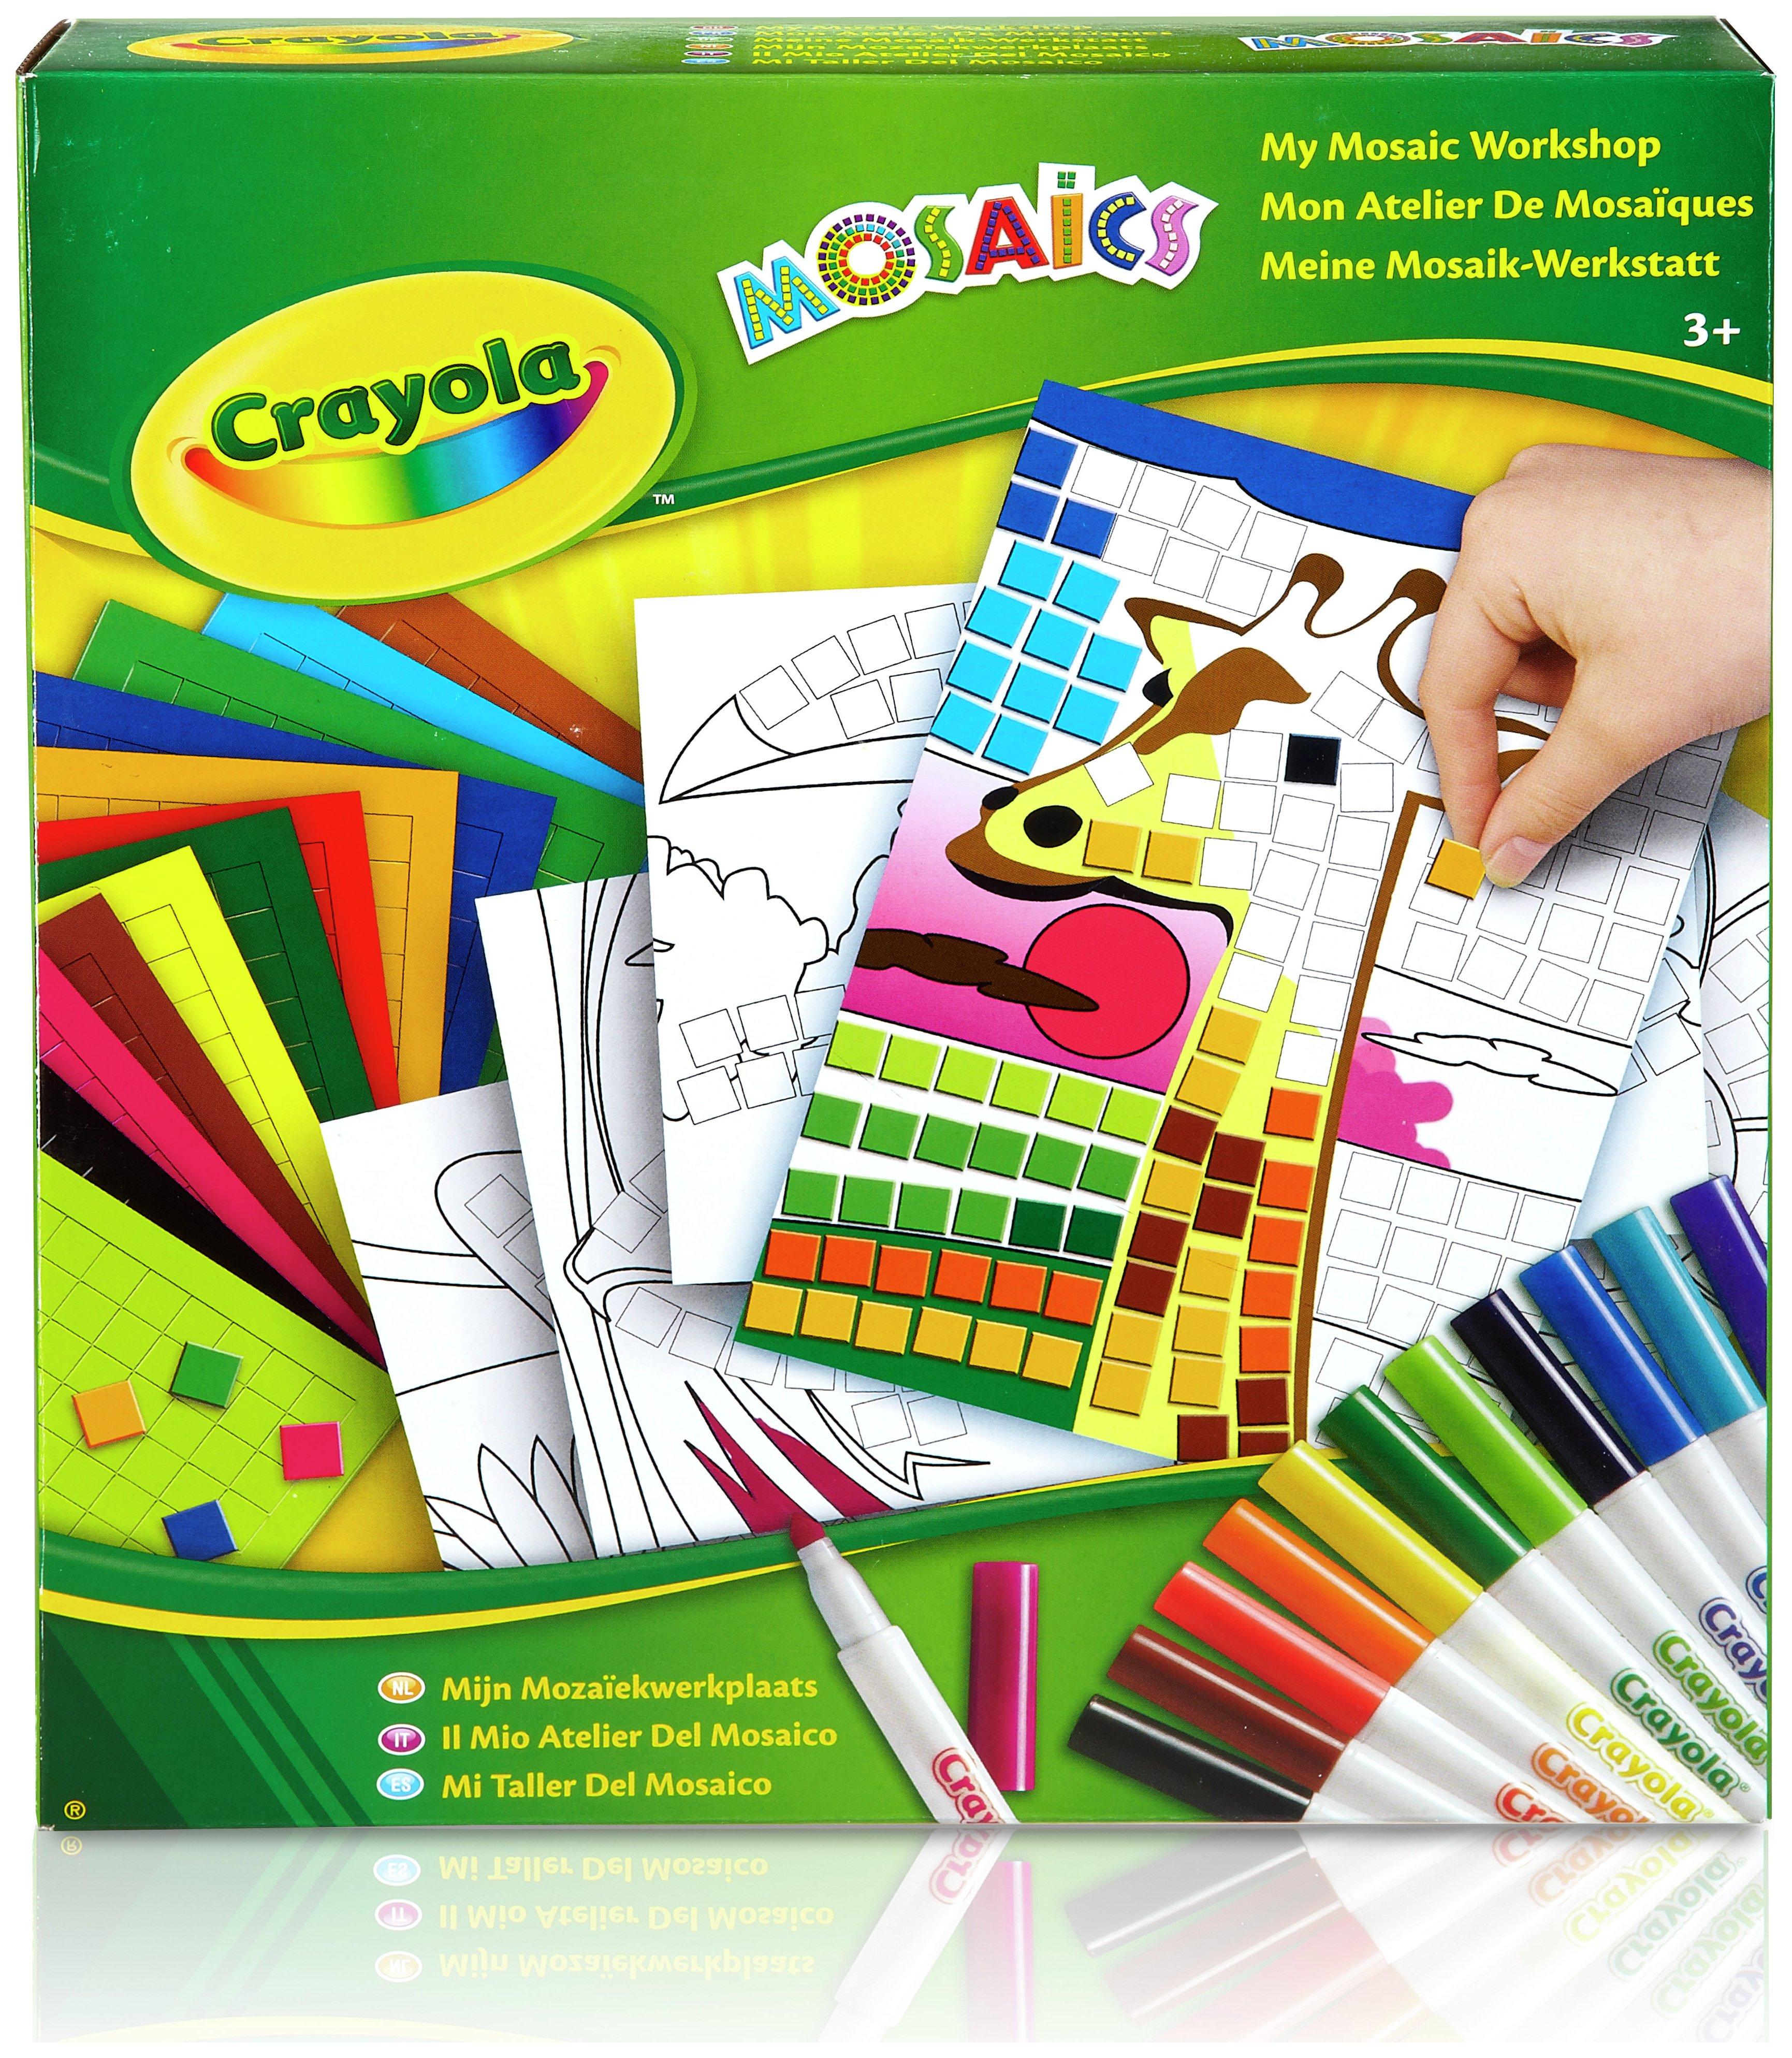 Image of Crayola Mosaic Madness Art Set